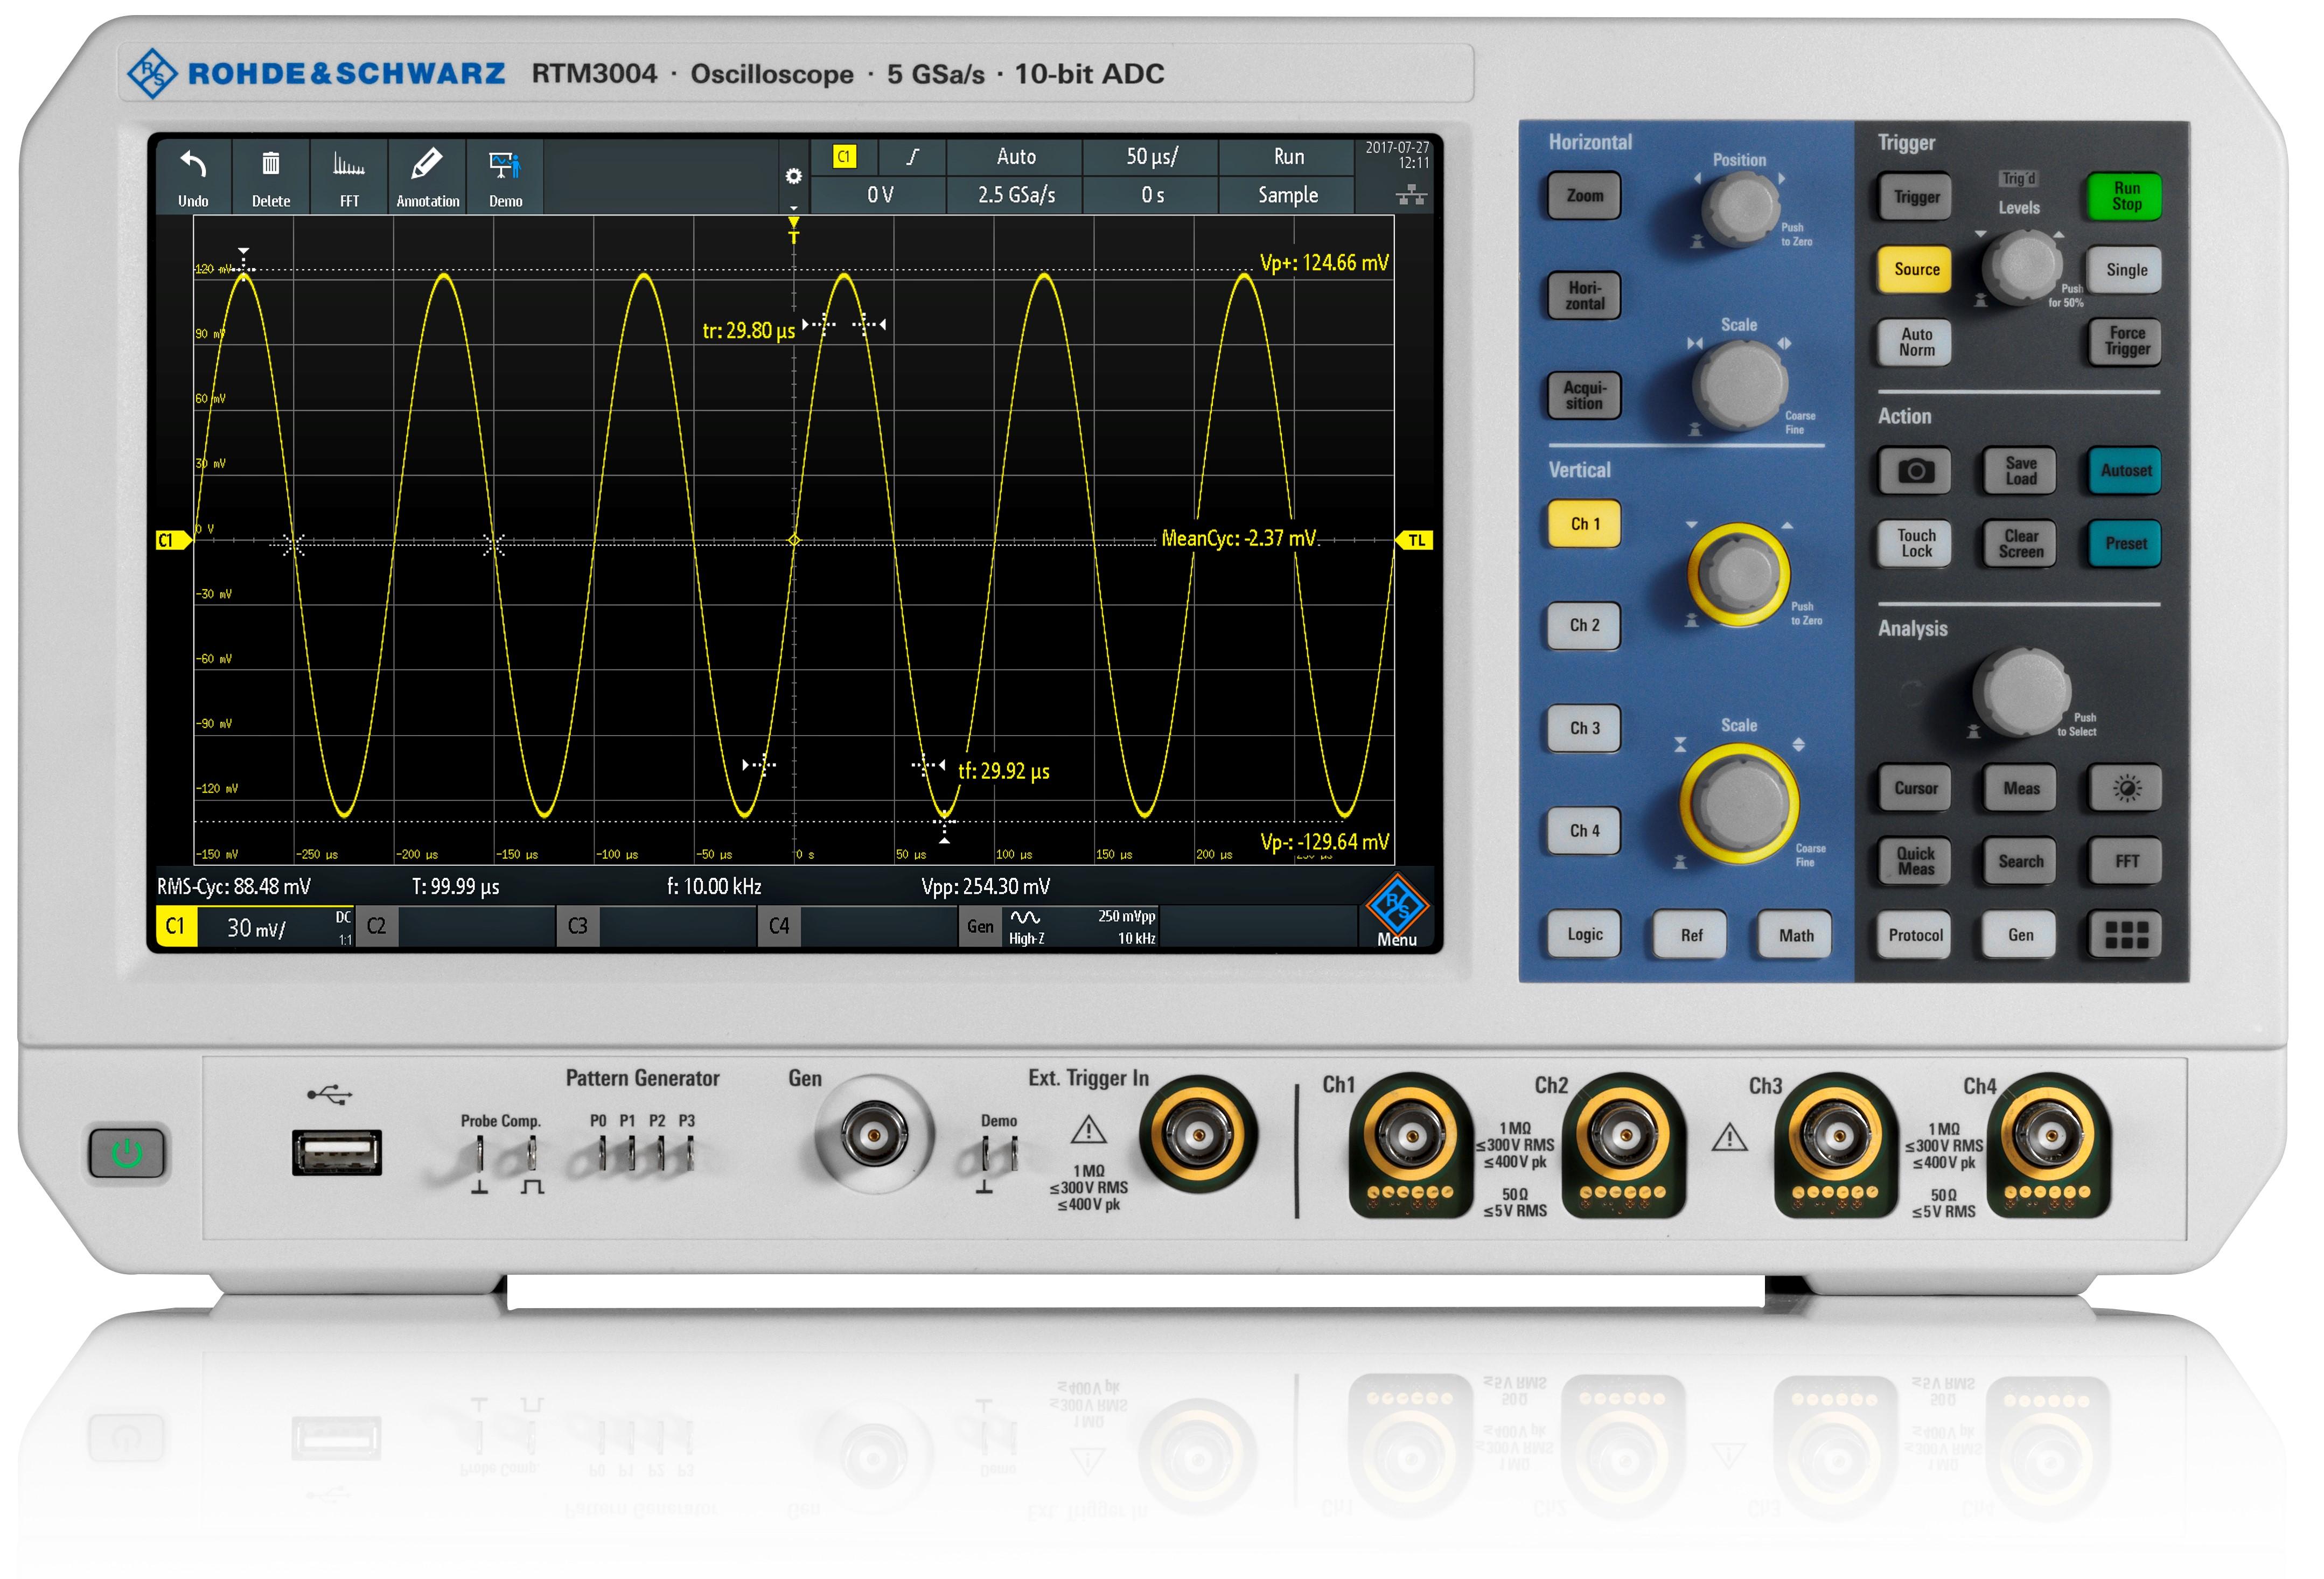 R&S RTM3000 series digital Oscilloscope